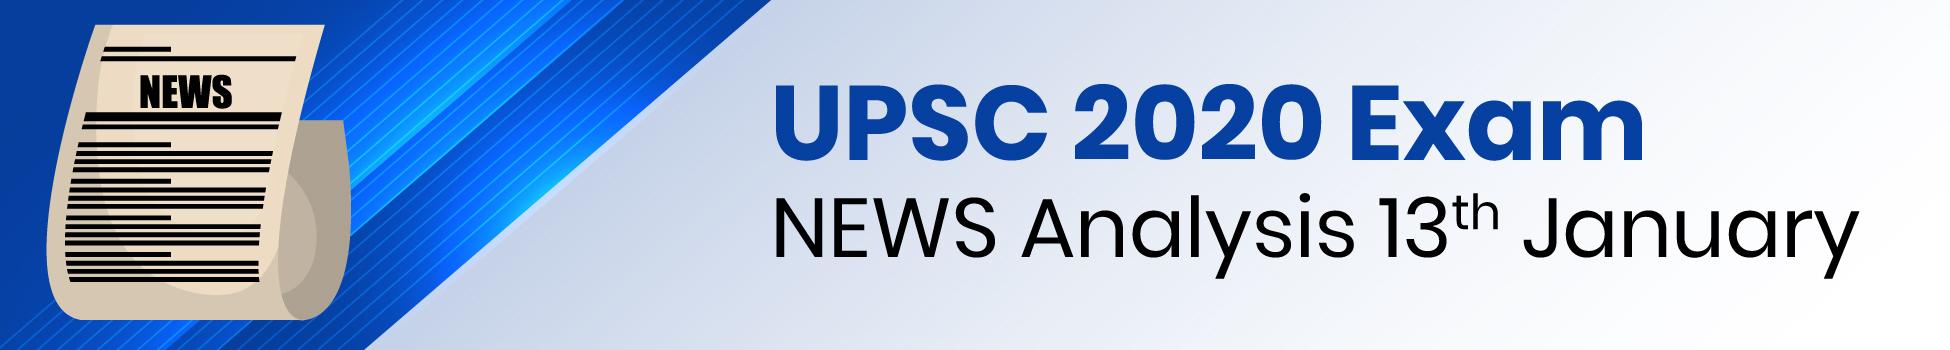 UPSC 2020 Exam - NEWS Analysis 13th January